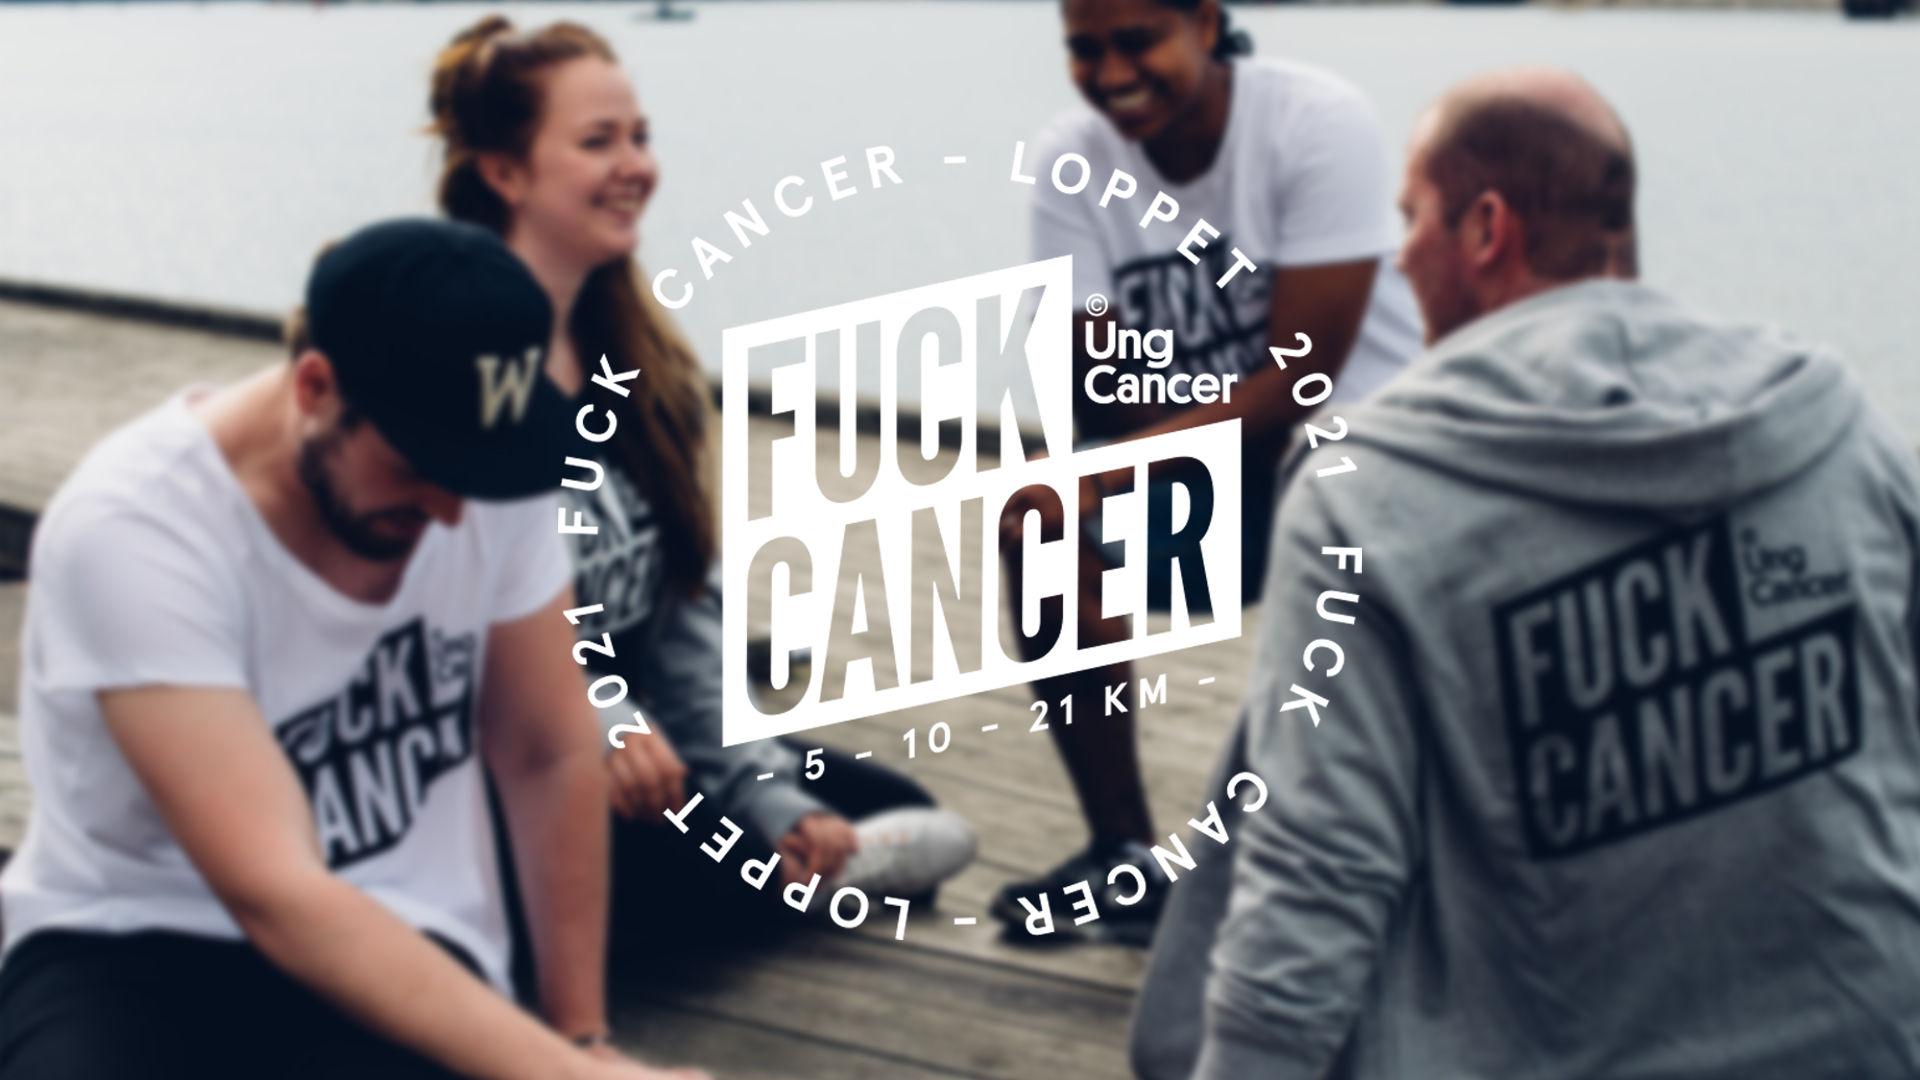 Fuck Cancer-loppet 2021 - 21 KM